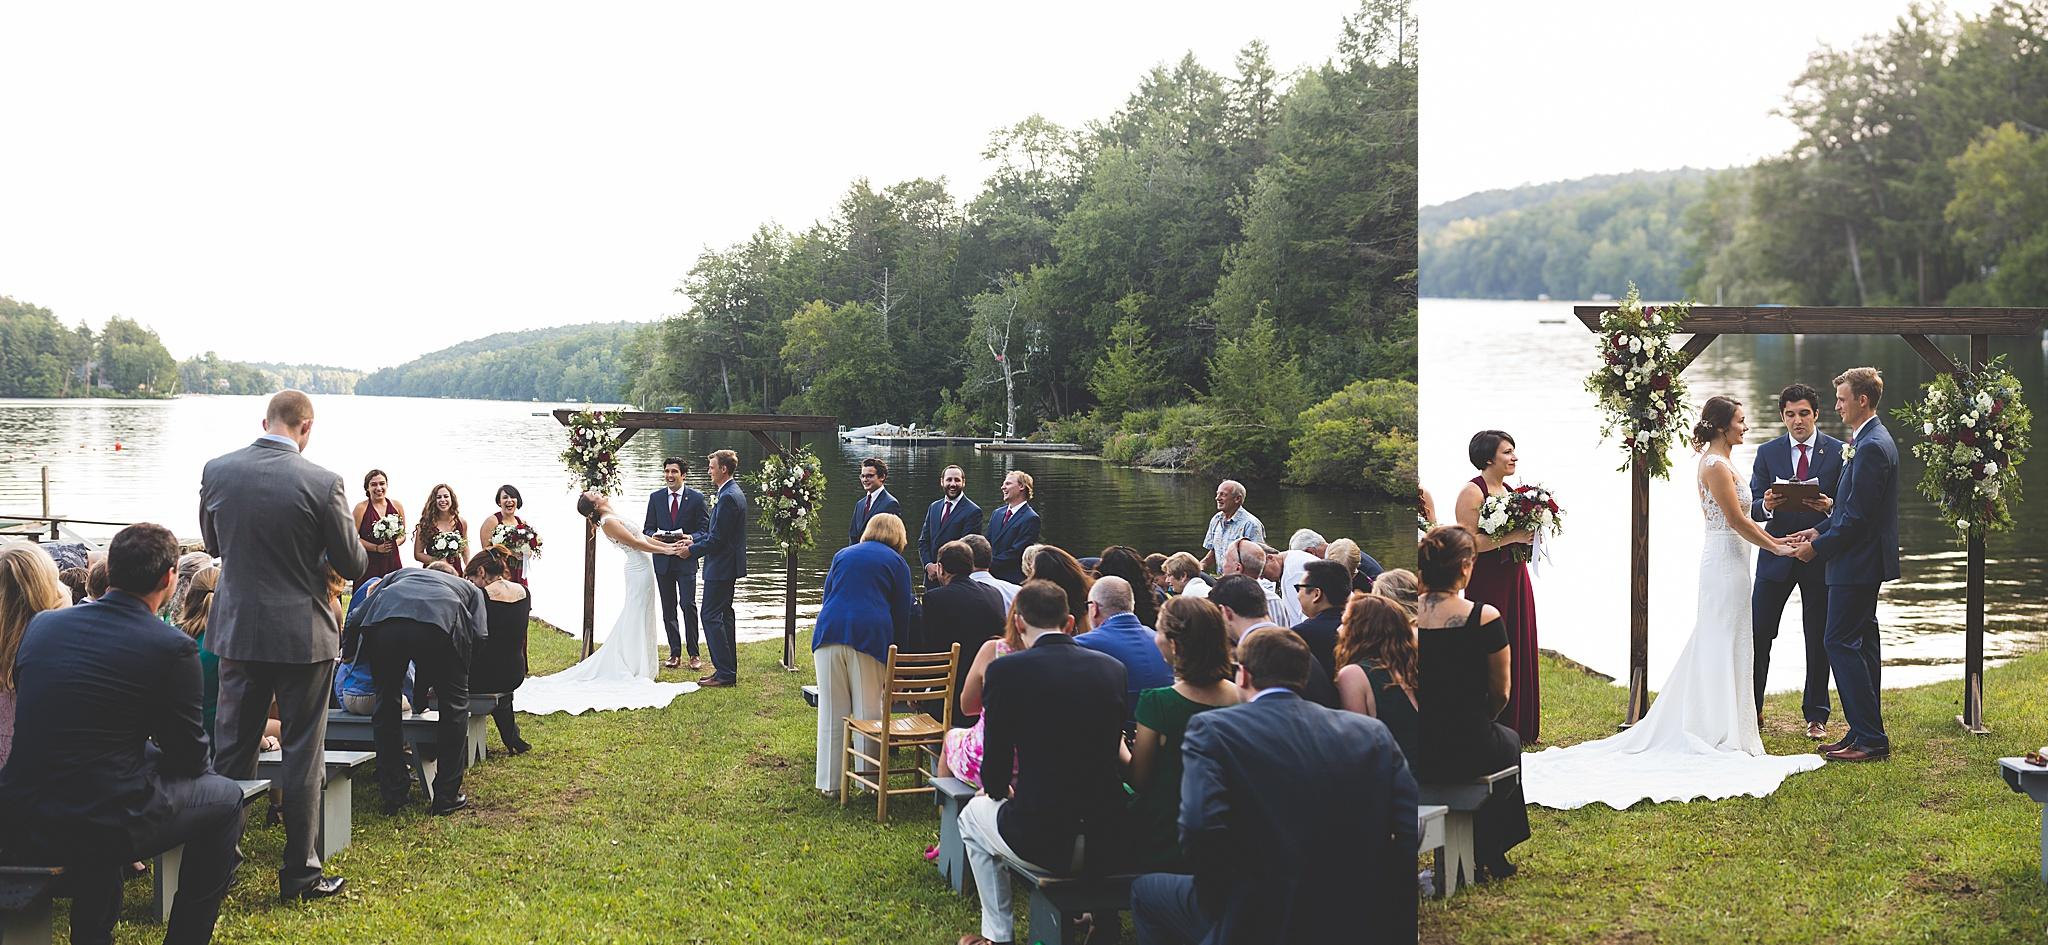 Albany_Wedding_Photographer_7515.jpg